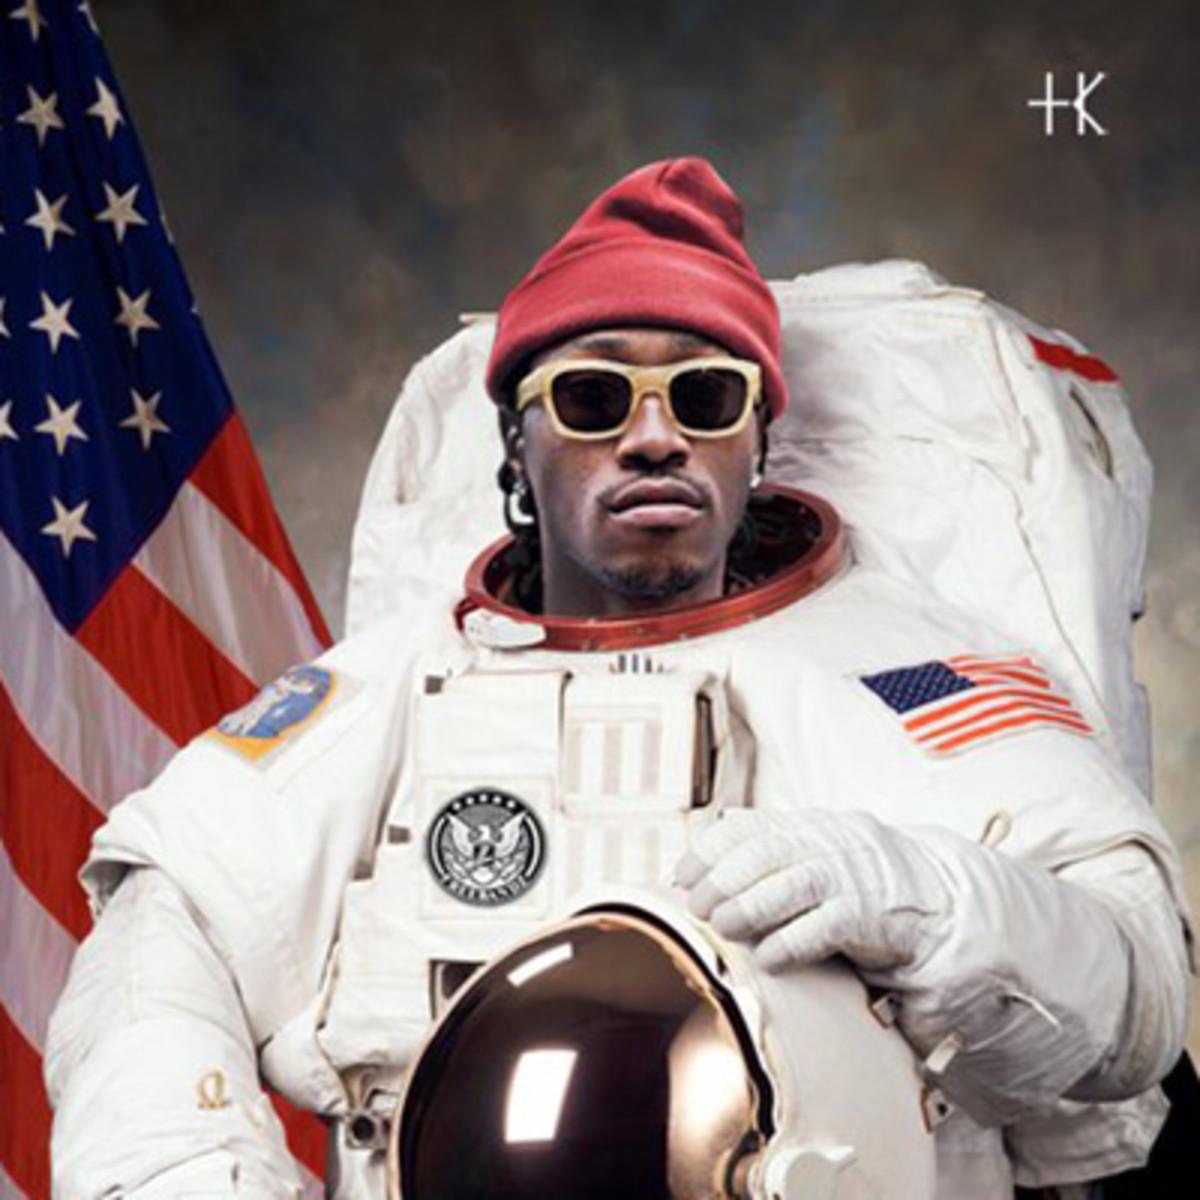 future-astronaut.jpg